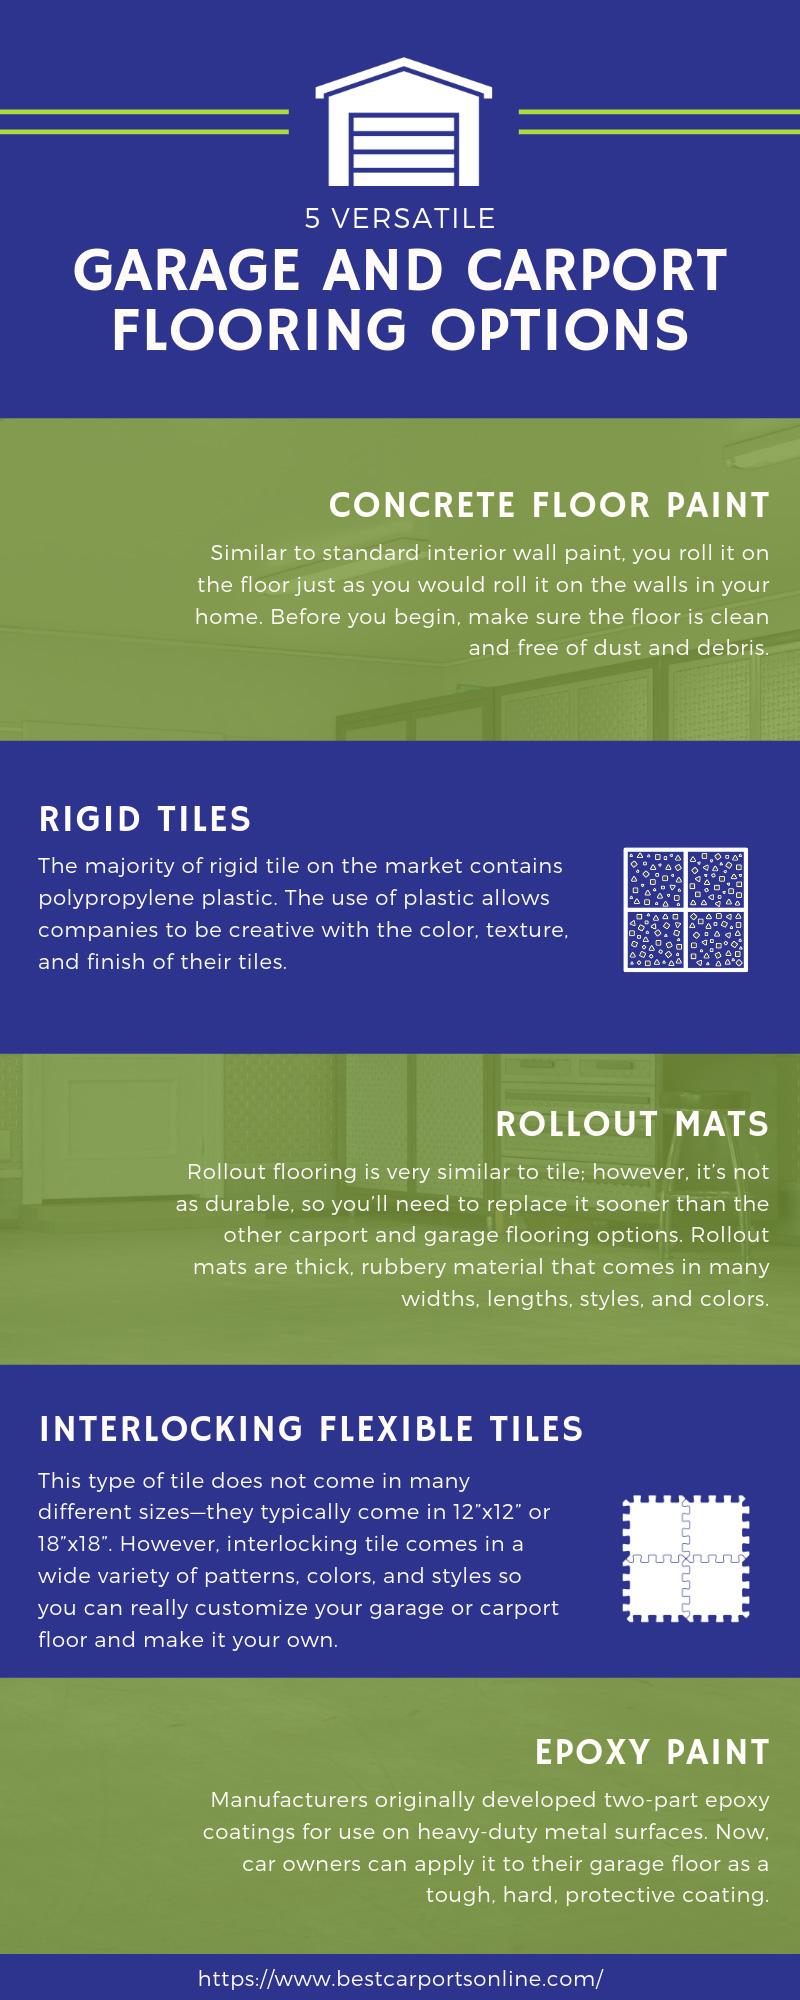 5 Versatile Garage and Carport Flooring Options